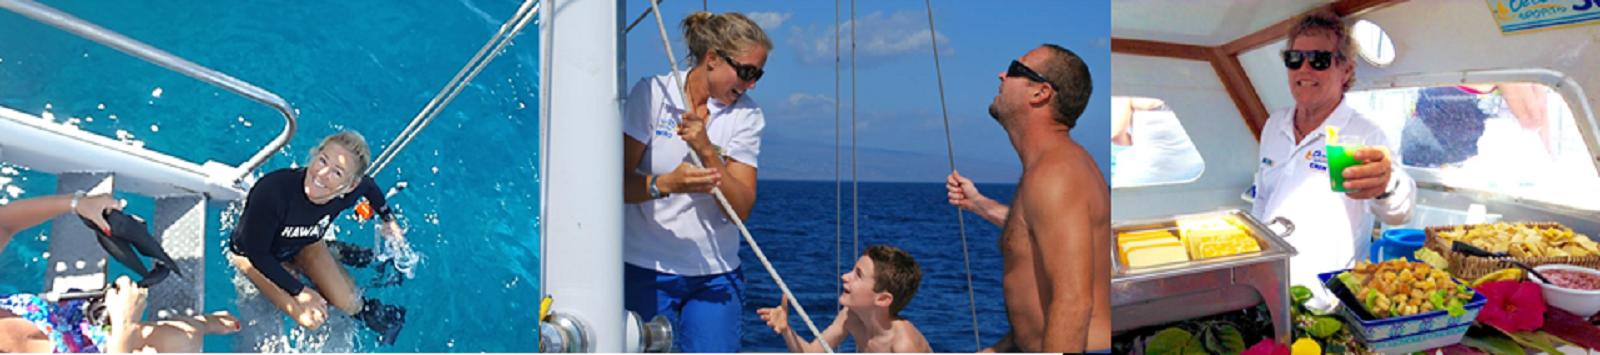 Hawaiian Ocean Sports - Snorkel Cruises